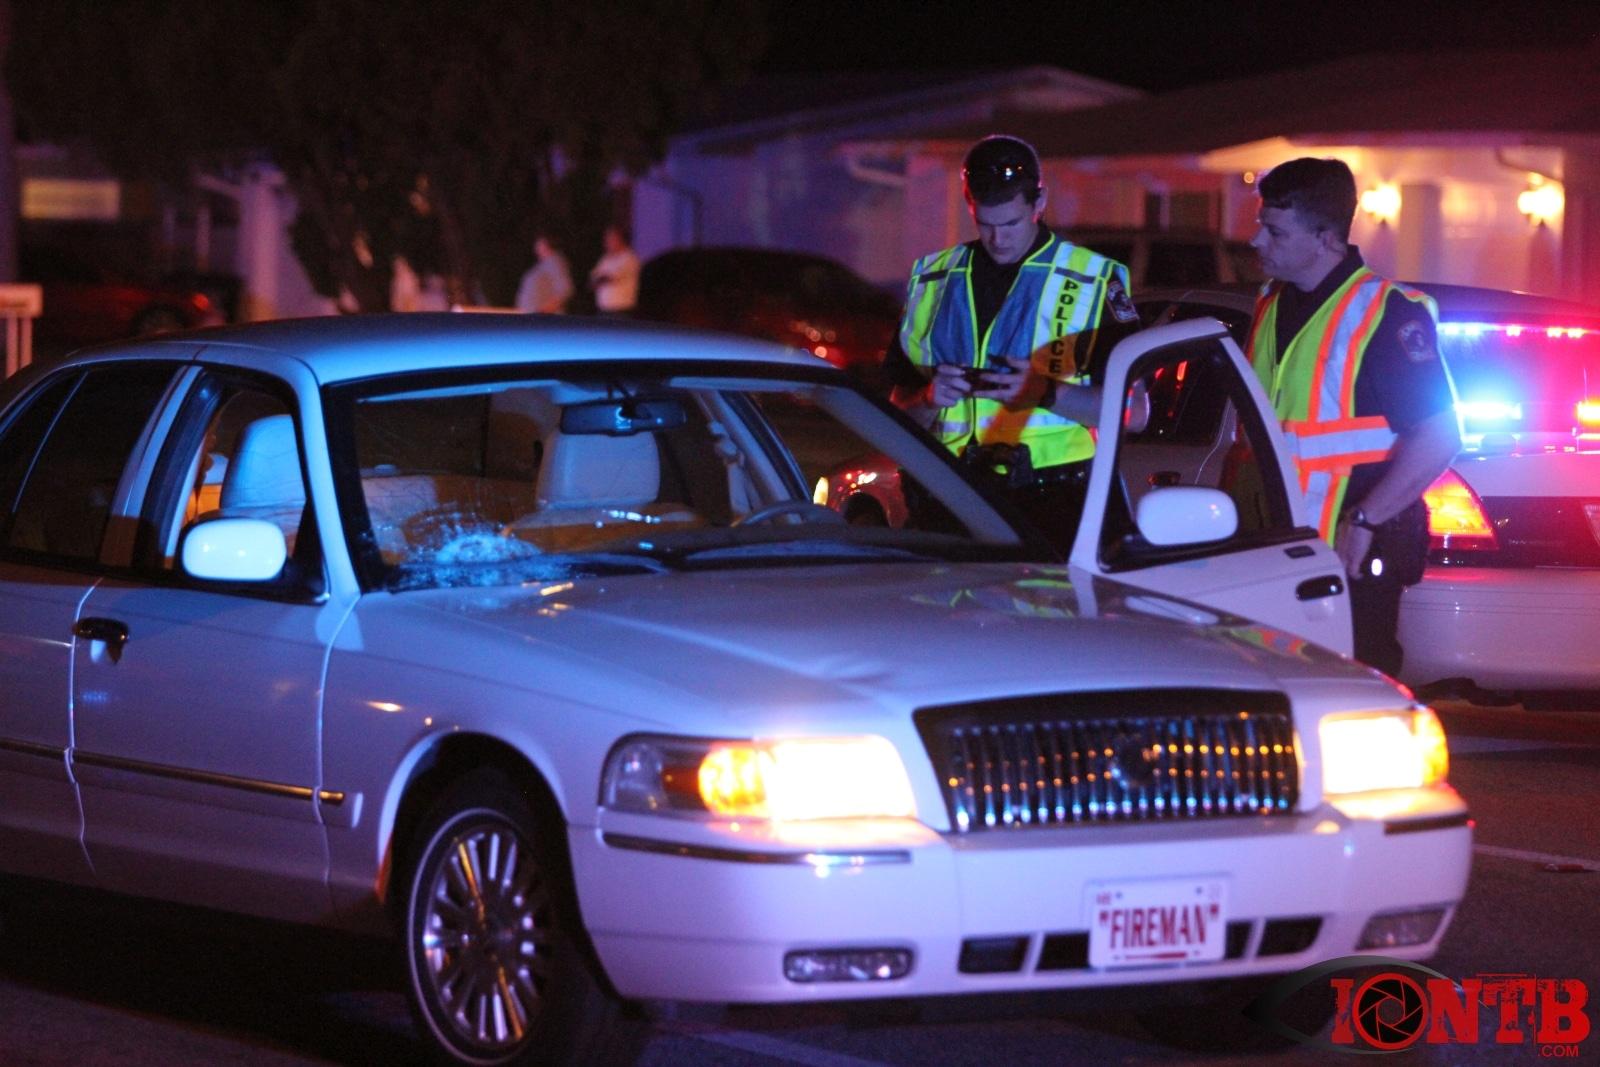 Female Pedestrian Struck on Keene Road in Largo Friday Night